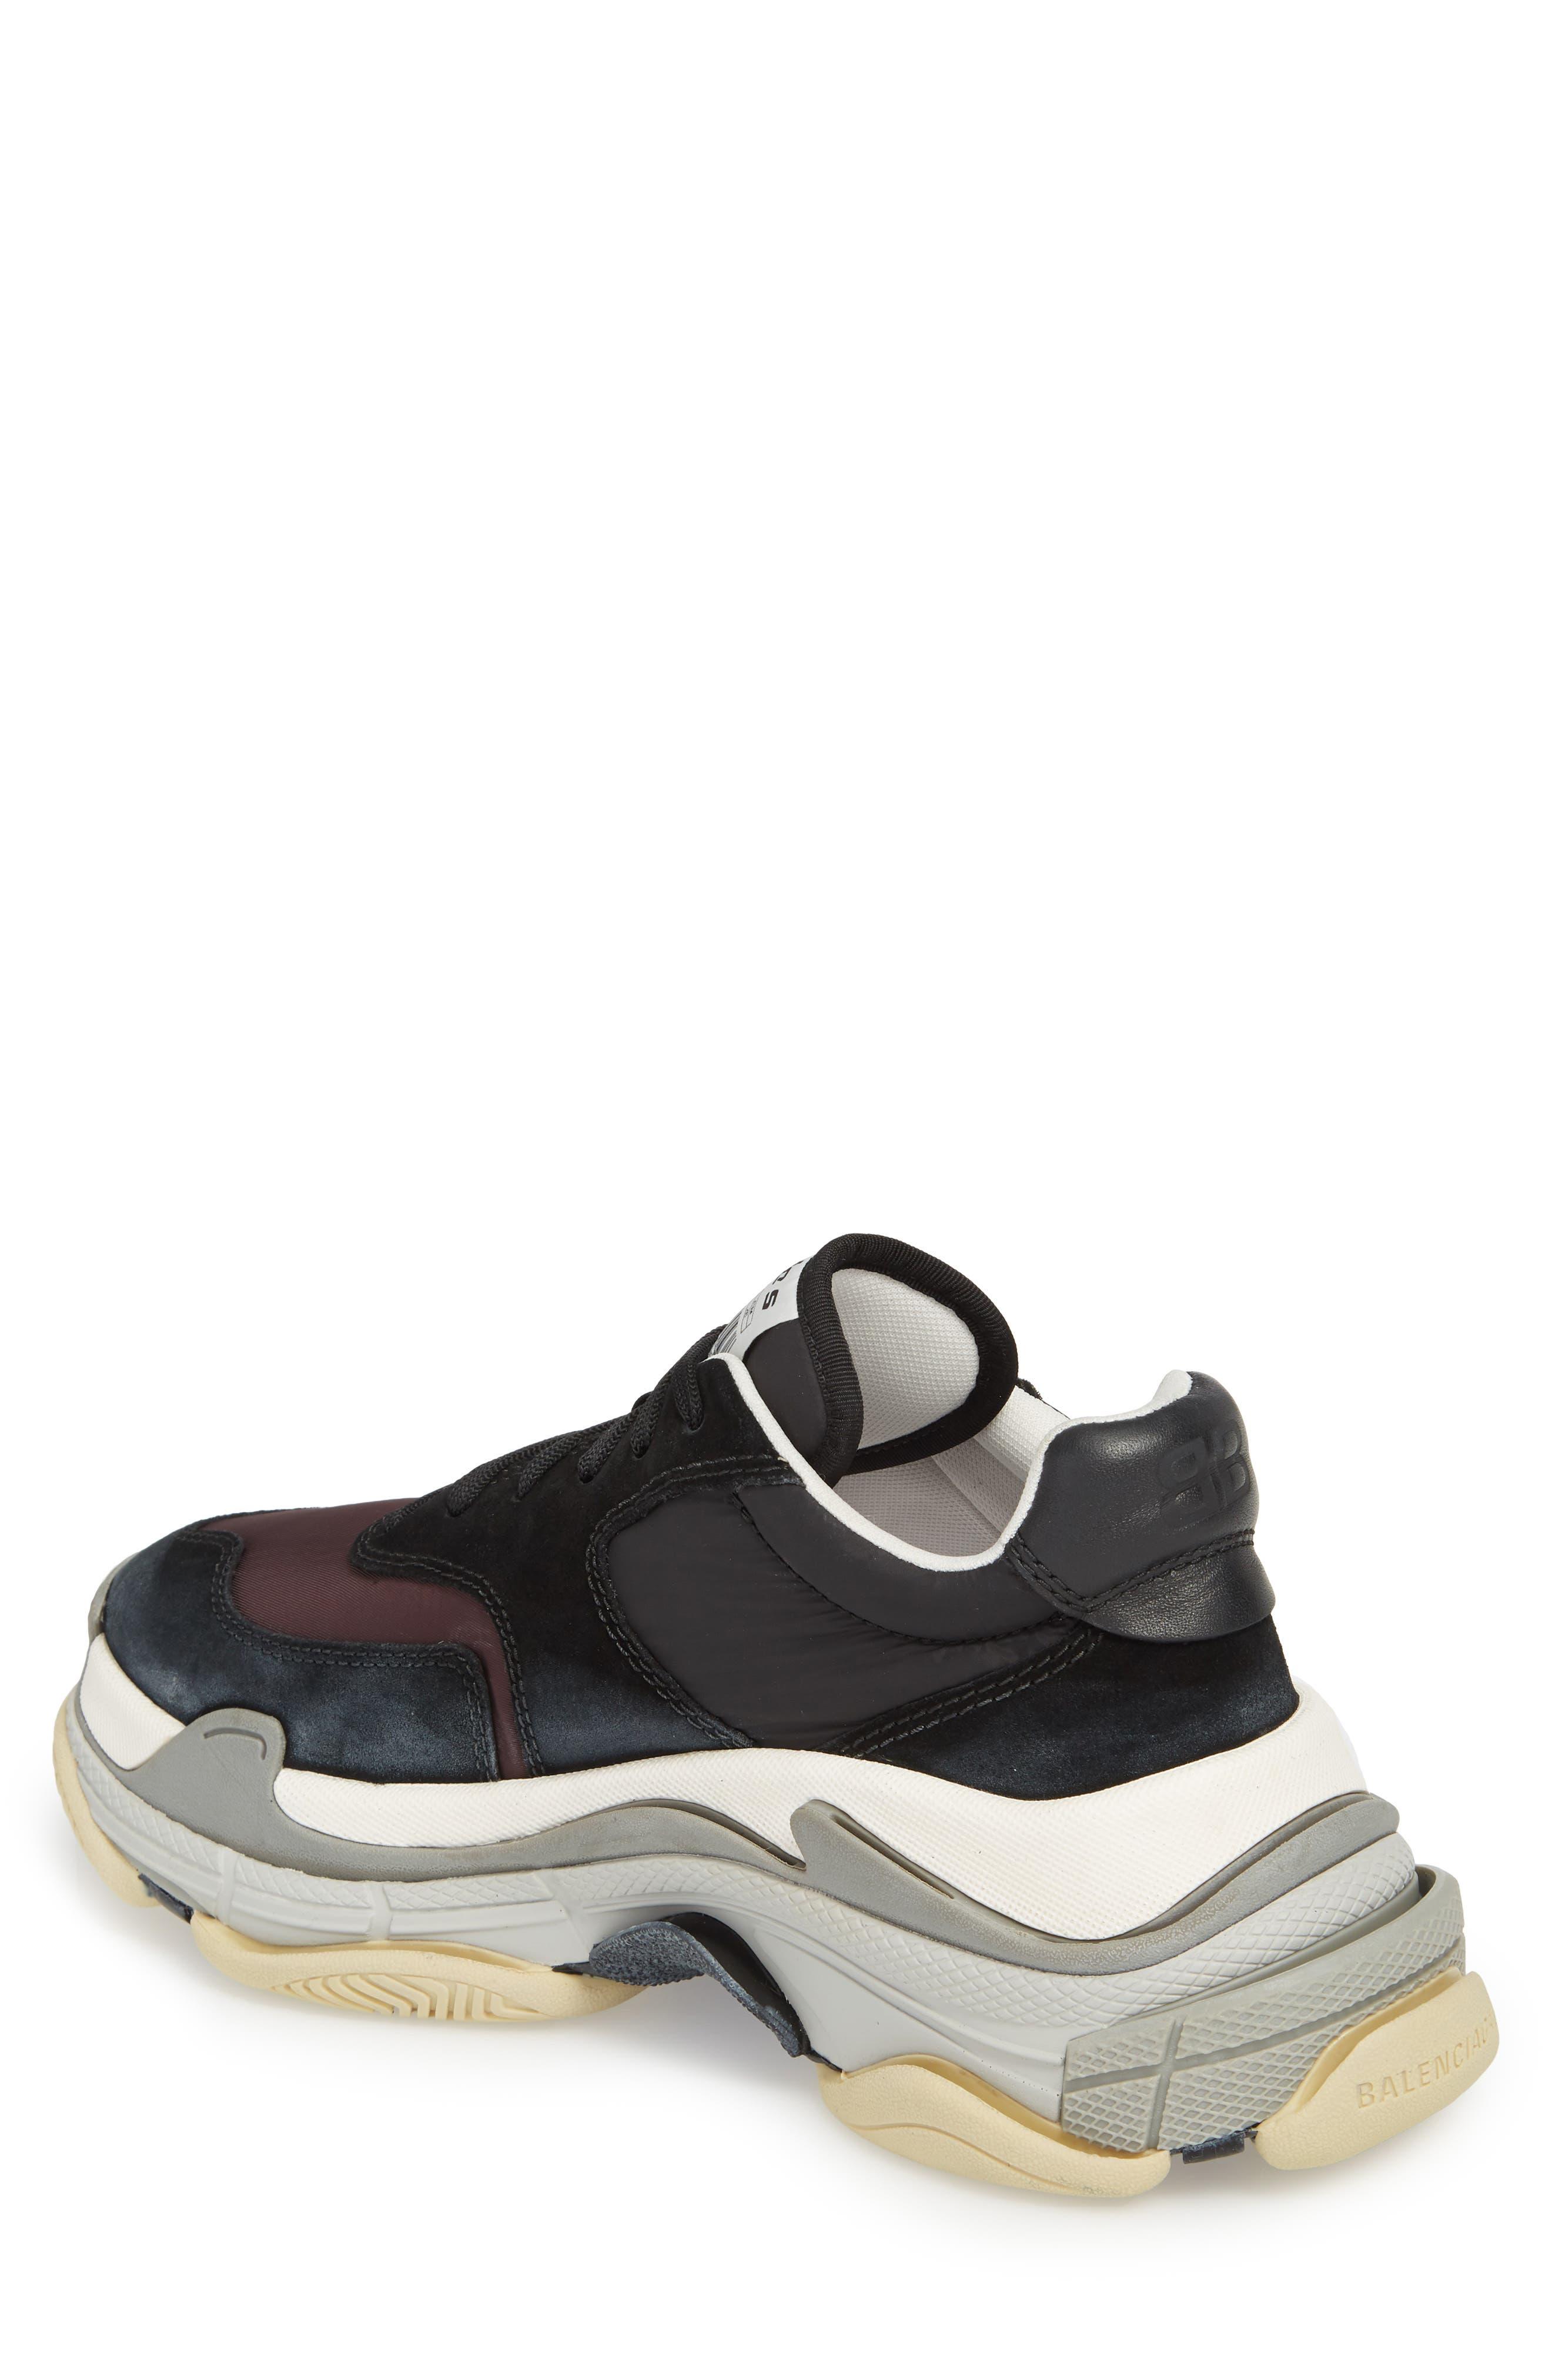 Triple S Retro Sneaker,                             Alternate thumbnail 2, color,                             Black/ Bordeaux